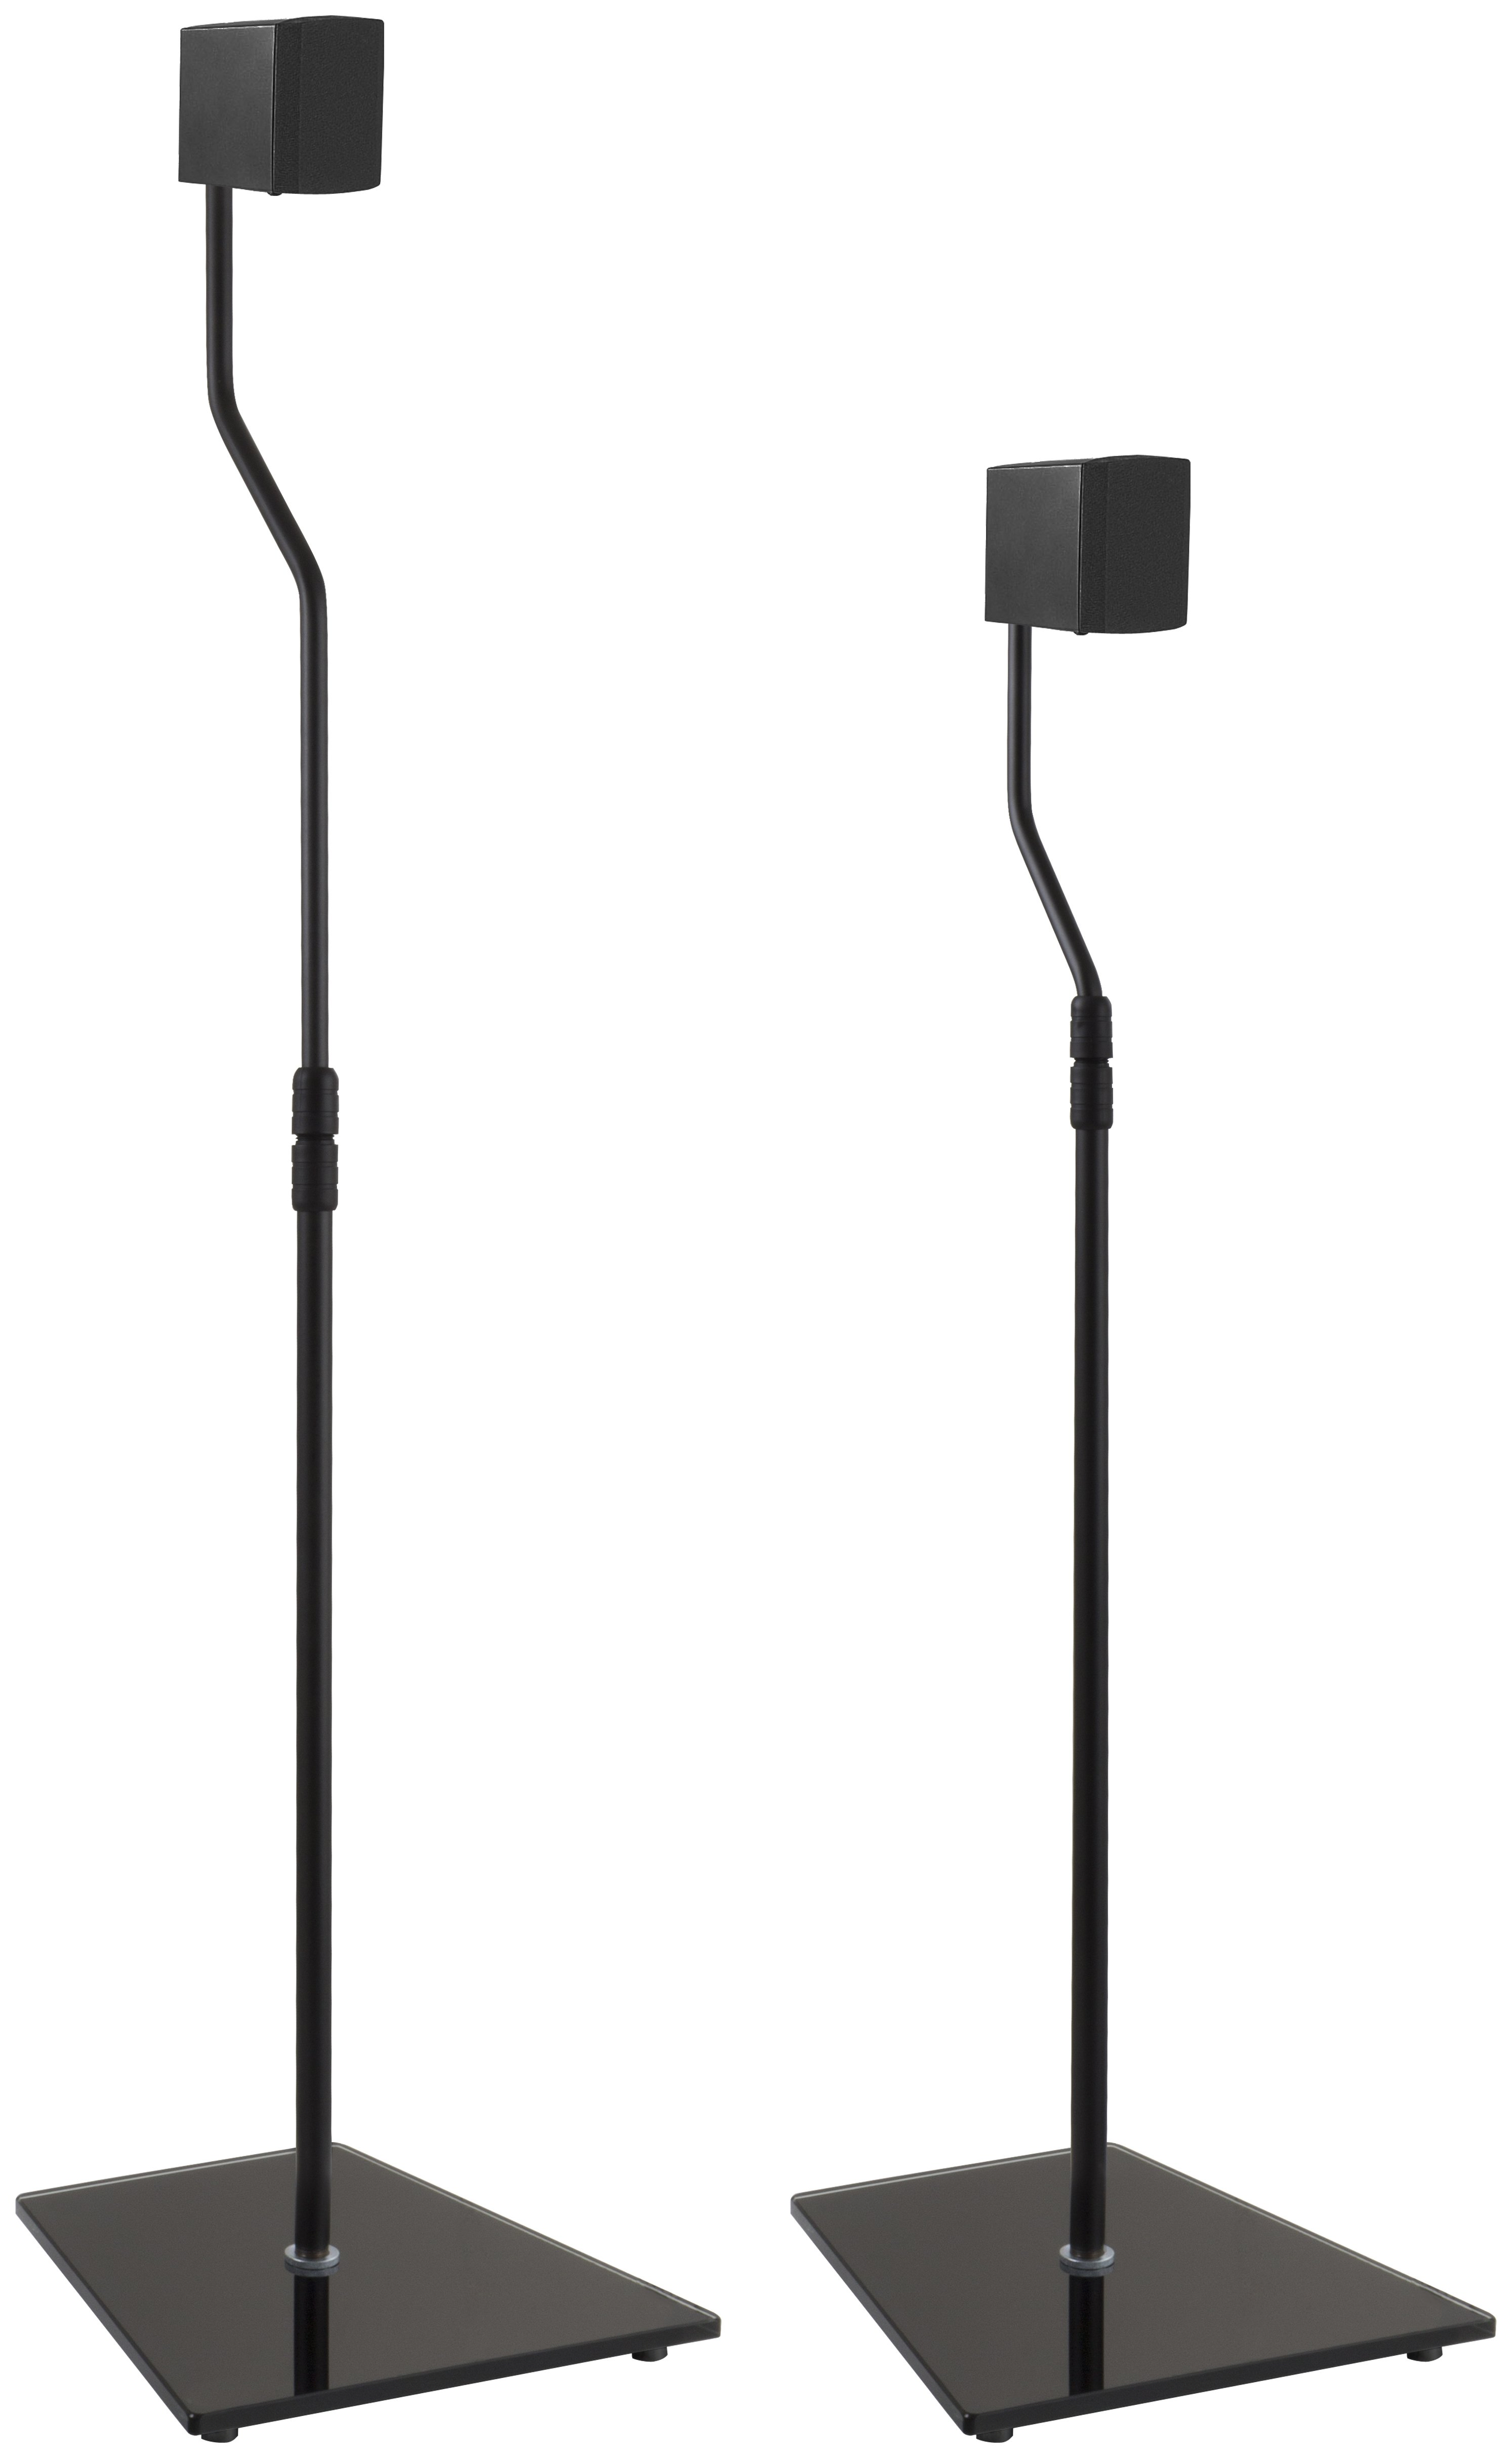 Image of AVF Surround Sound Speaker Stand - Black Glass.